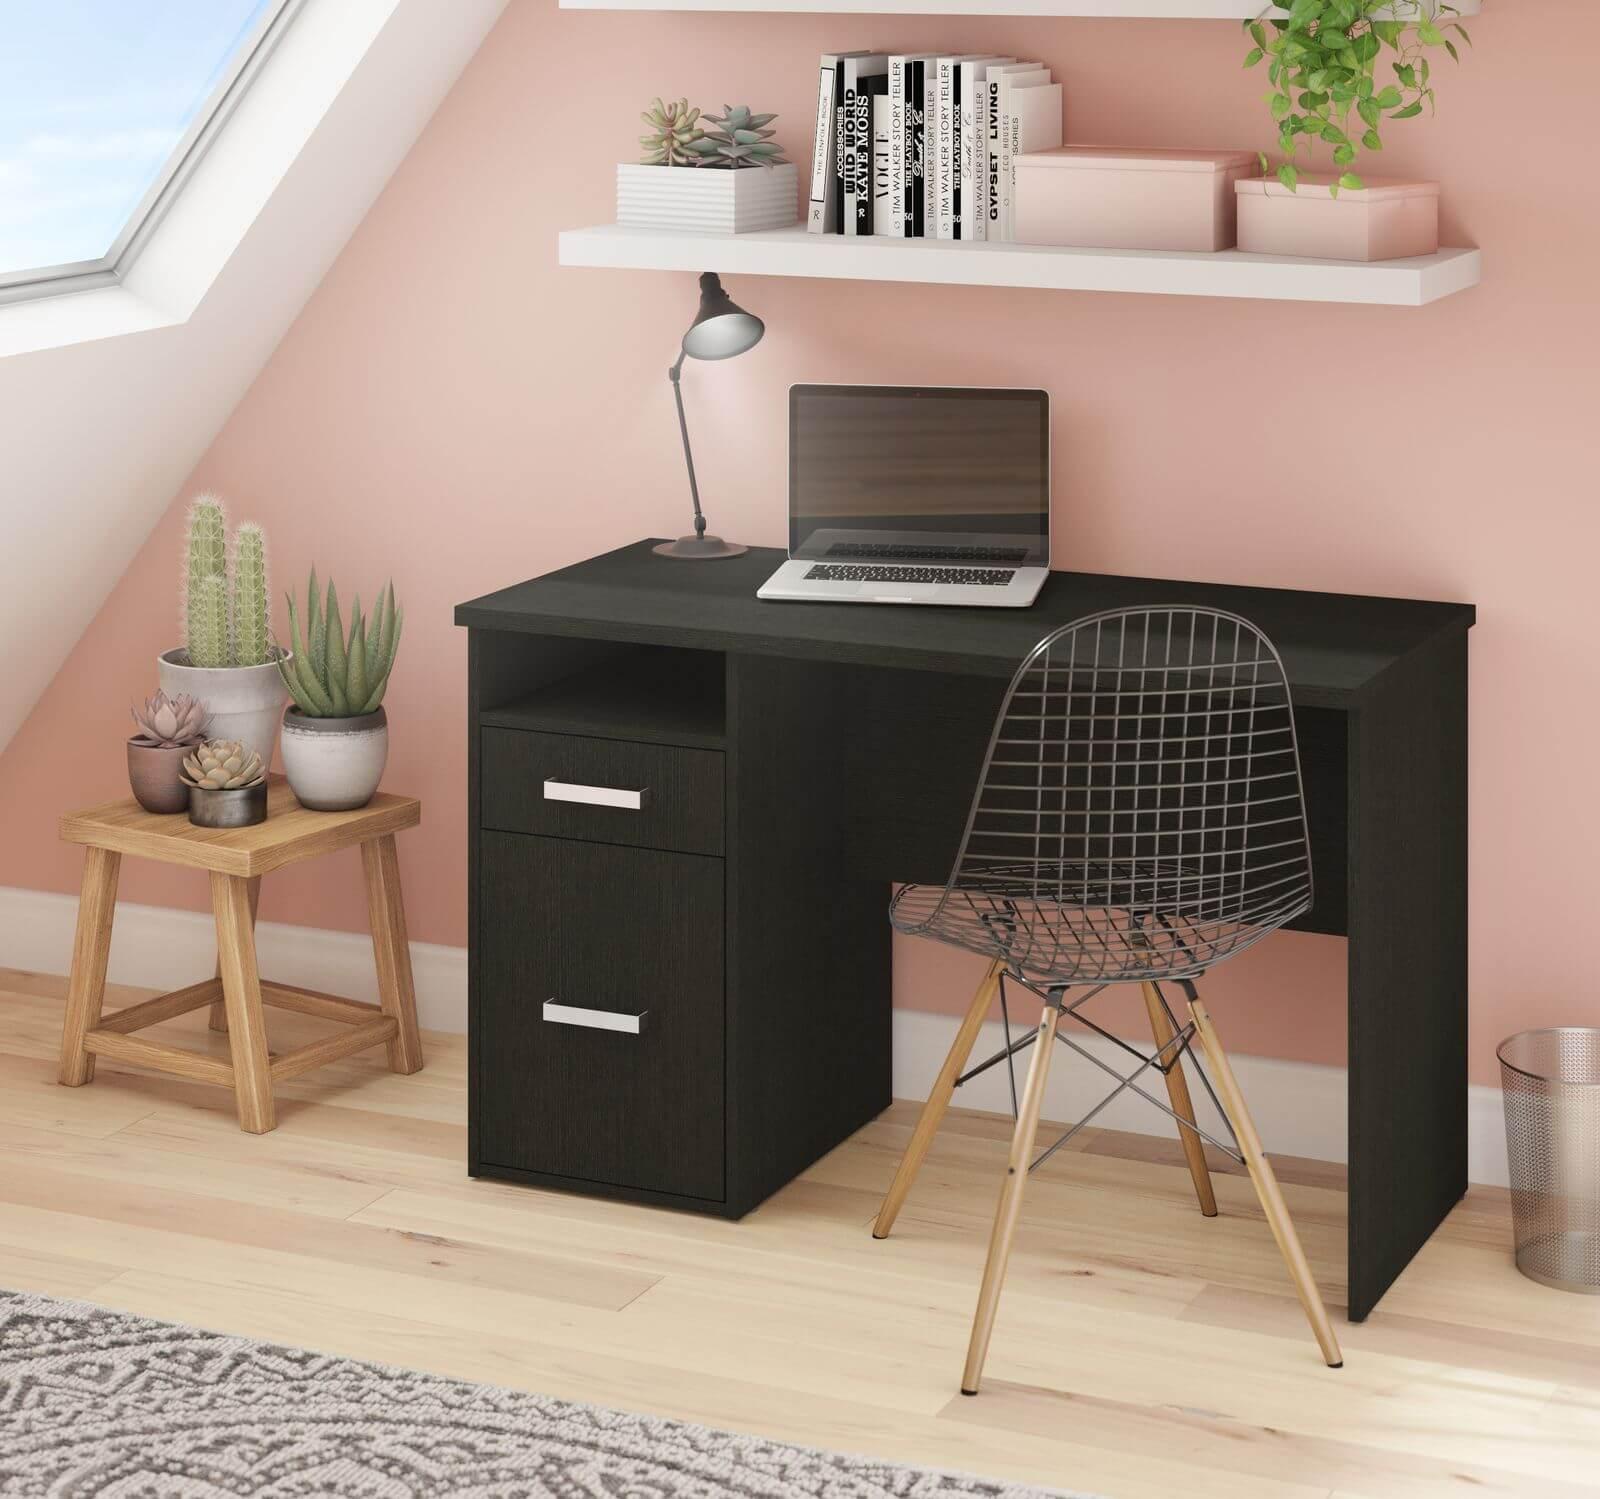 Petit bureau avec mur rose